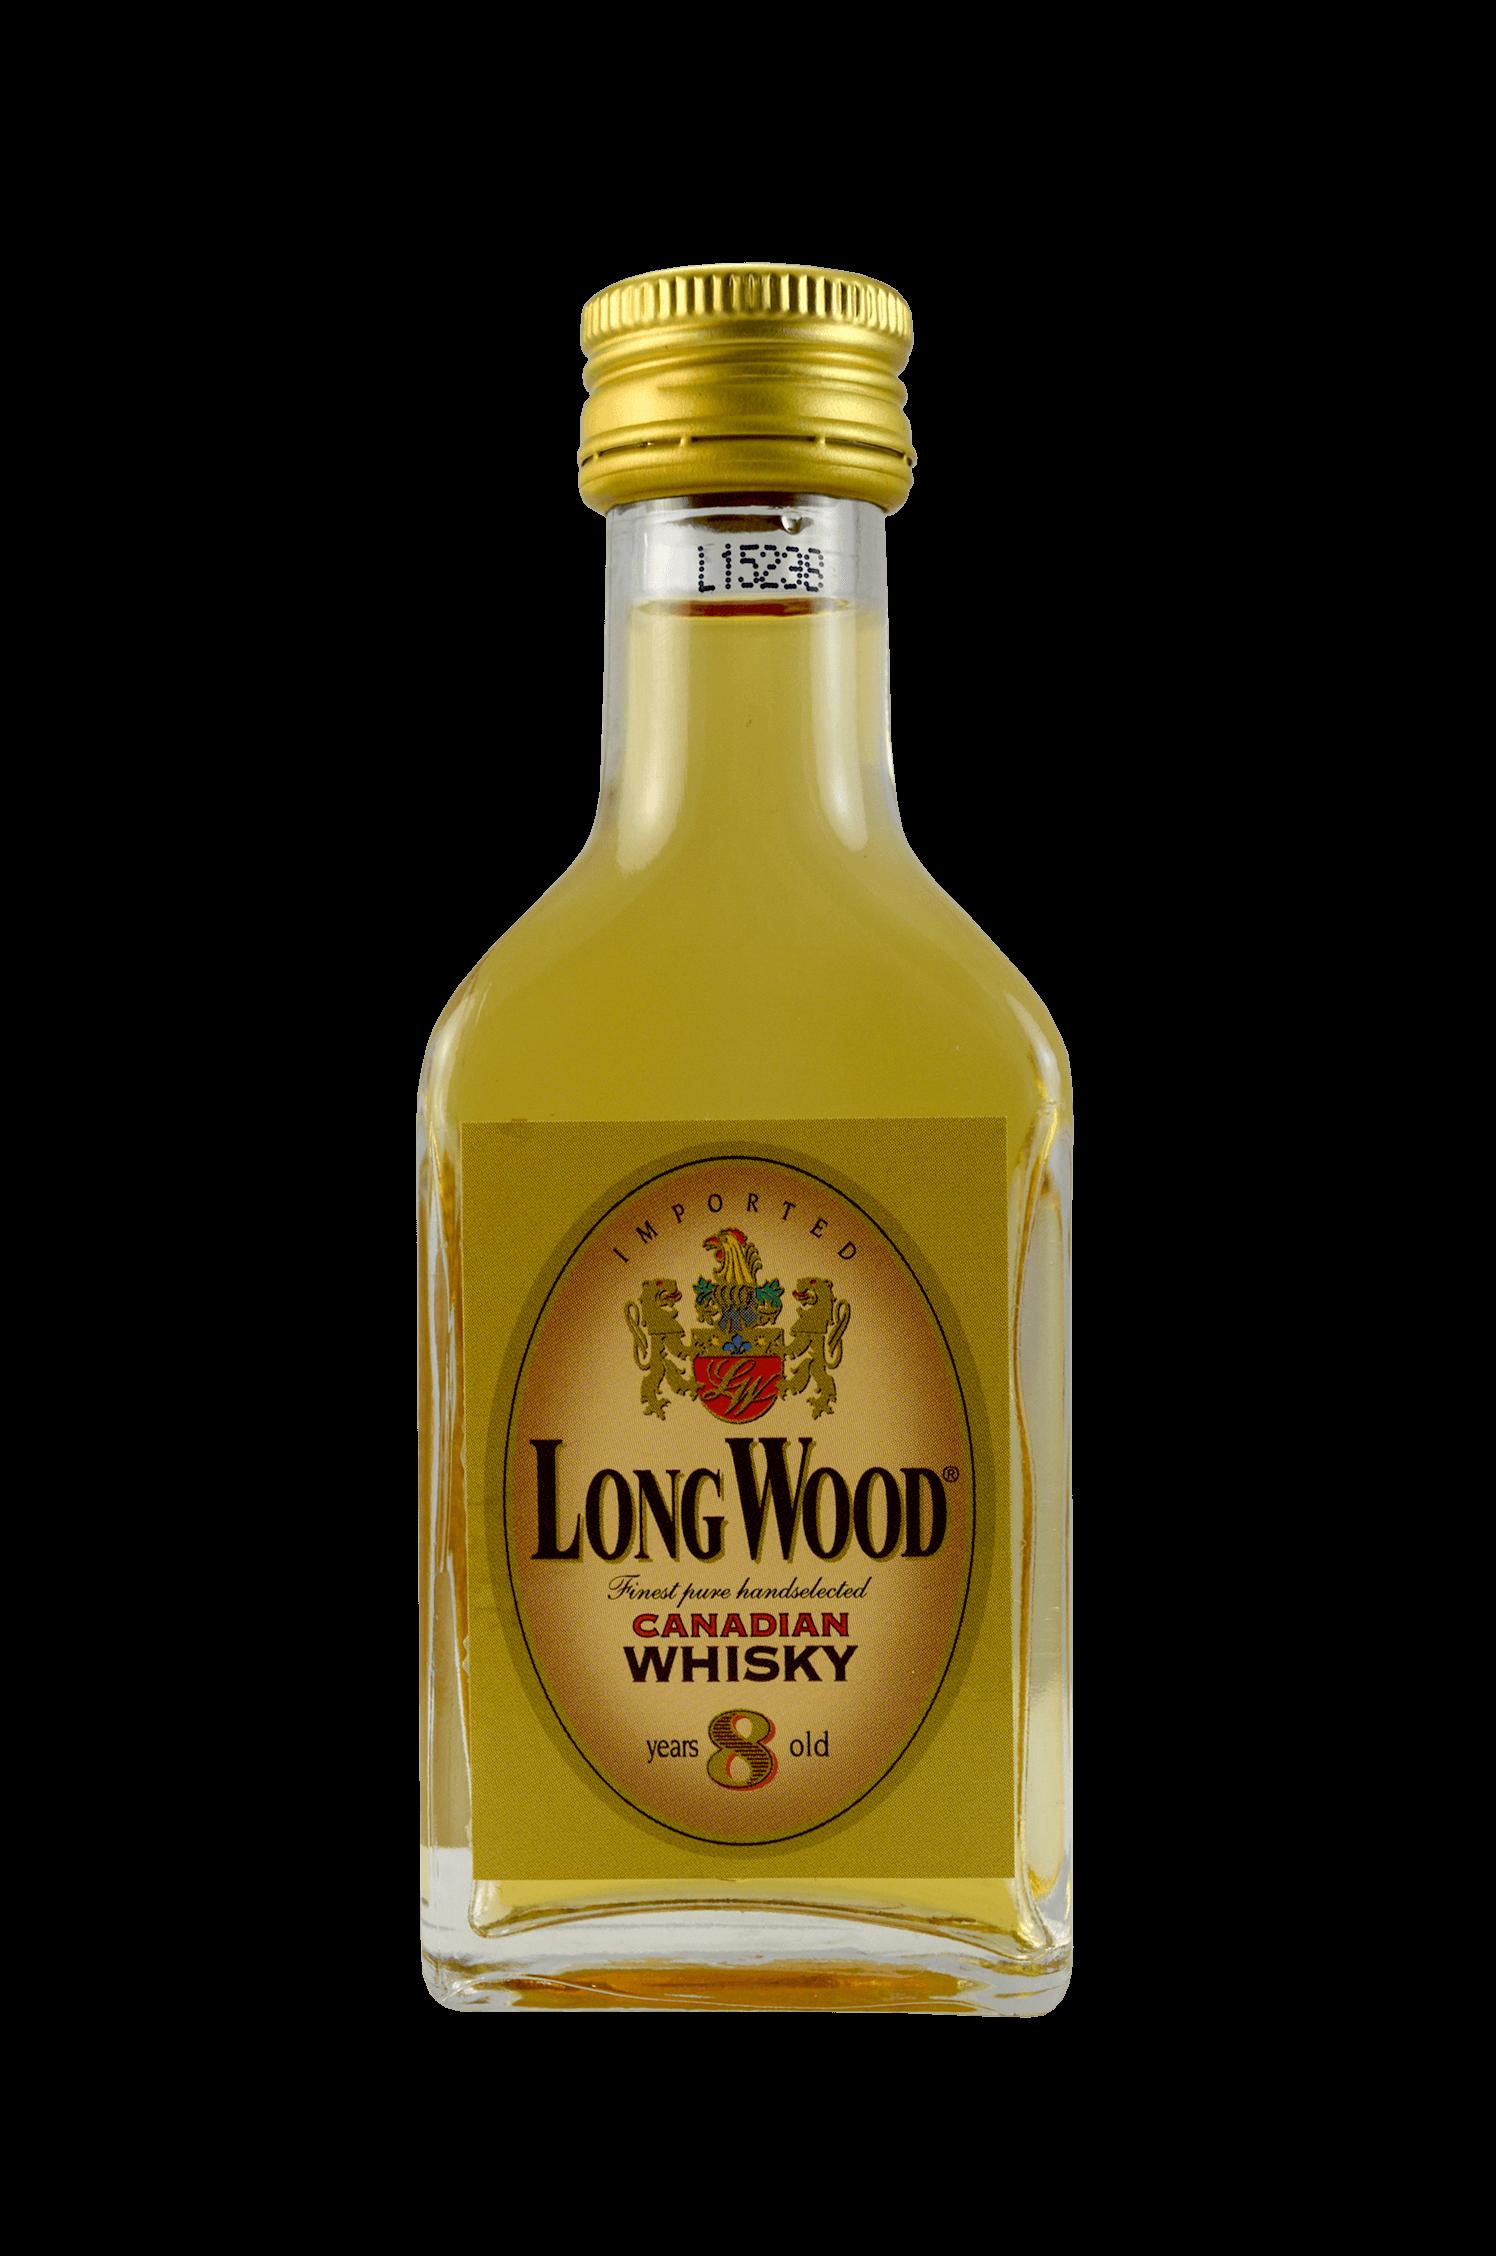 Long Wood Canadian Whisky